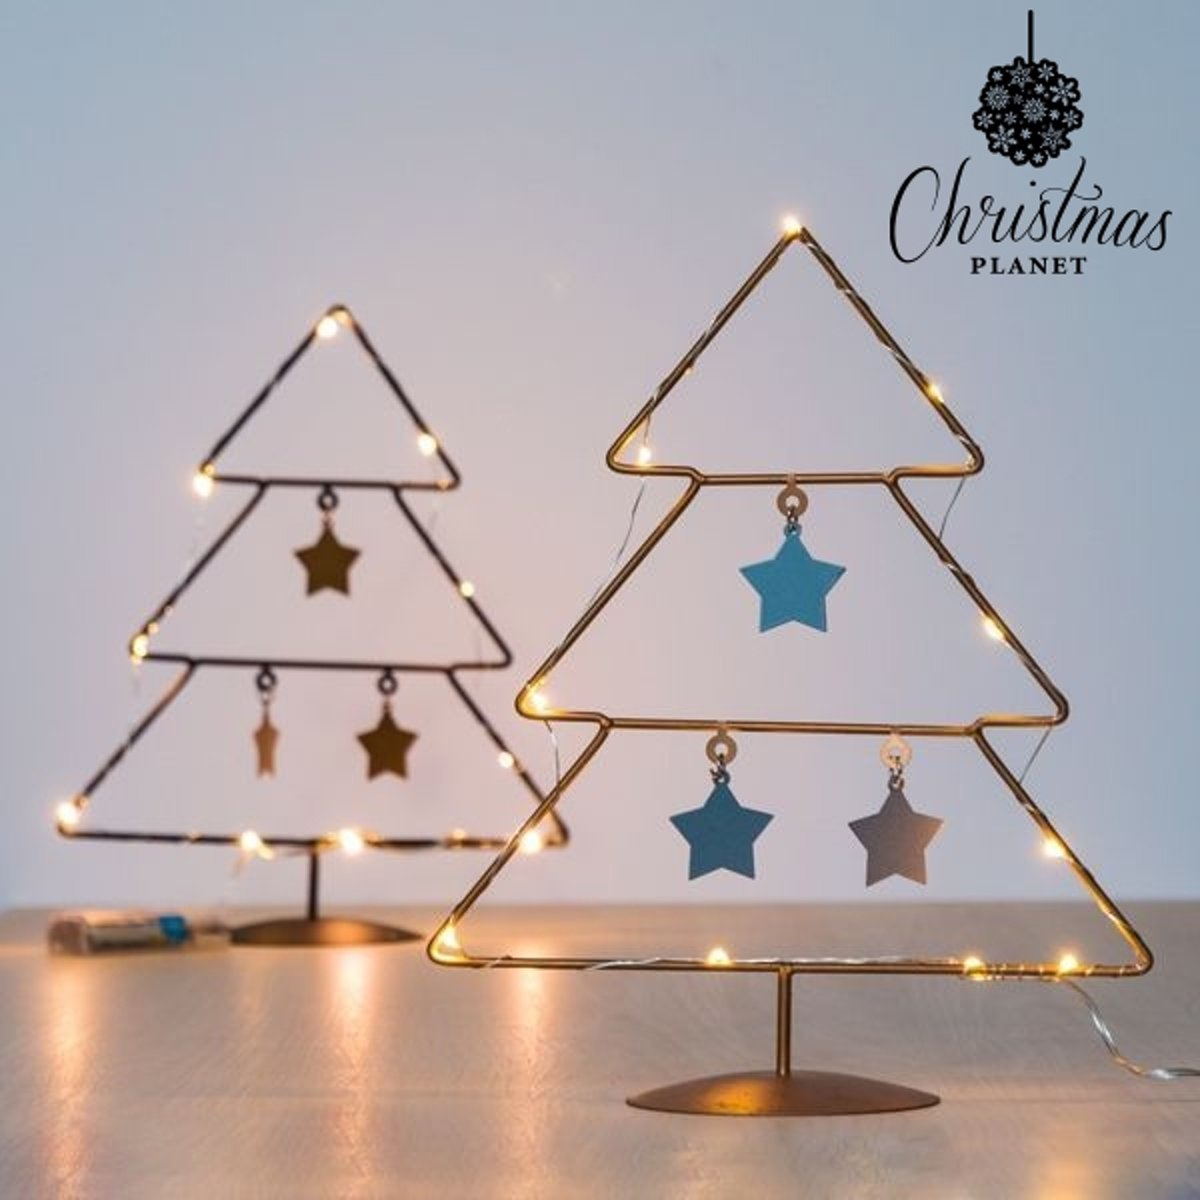 Kerstboom met Sterren en LED licht - (10 LEDs)